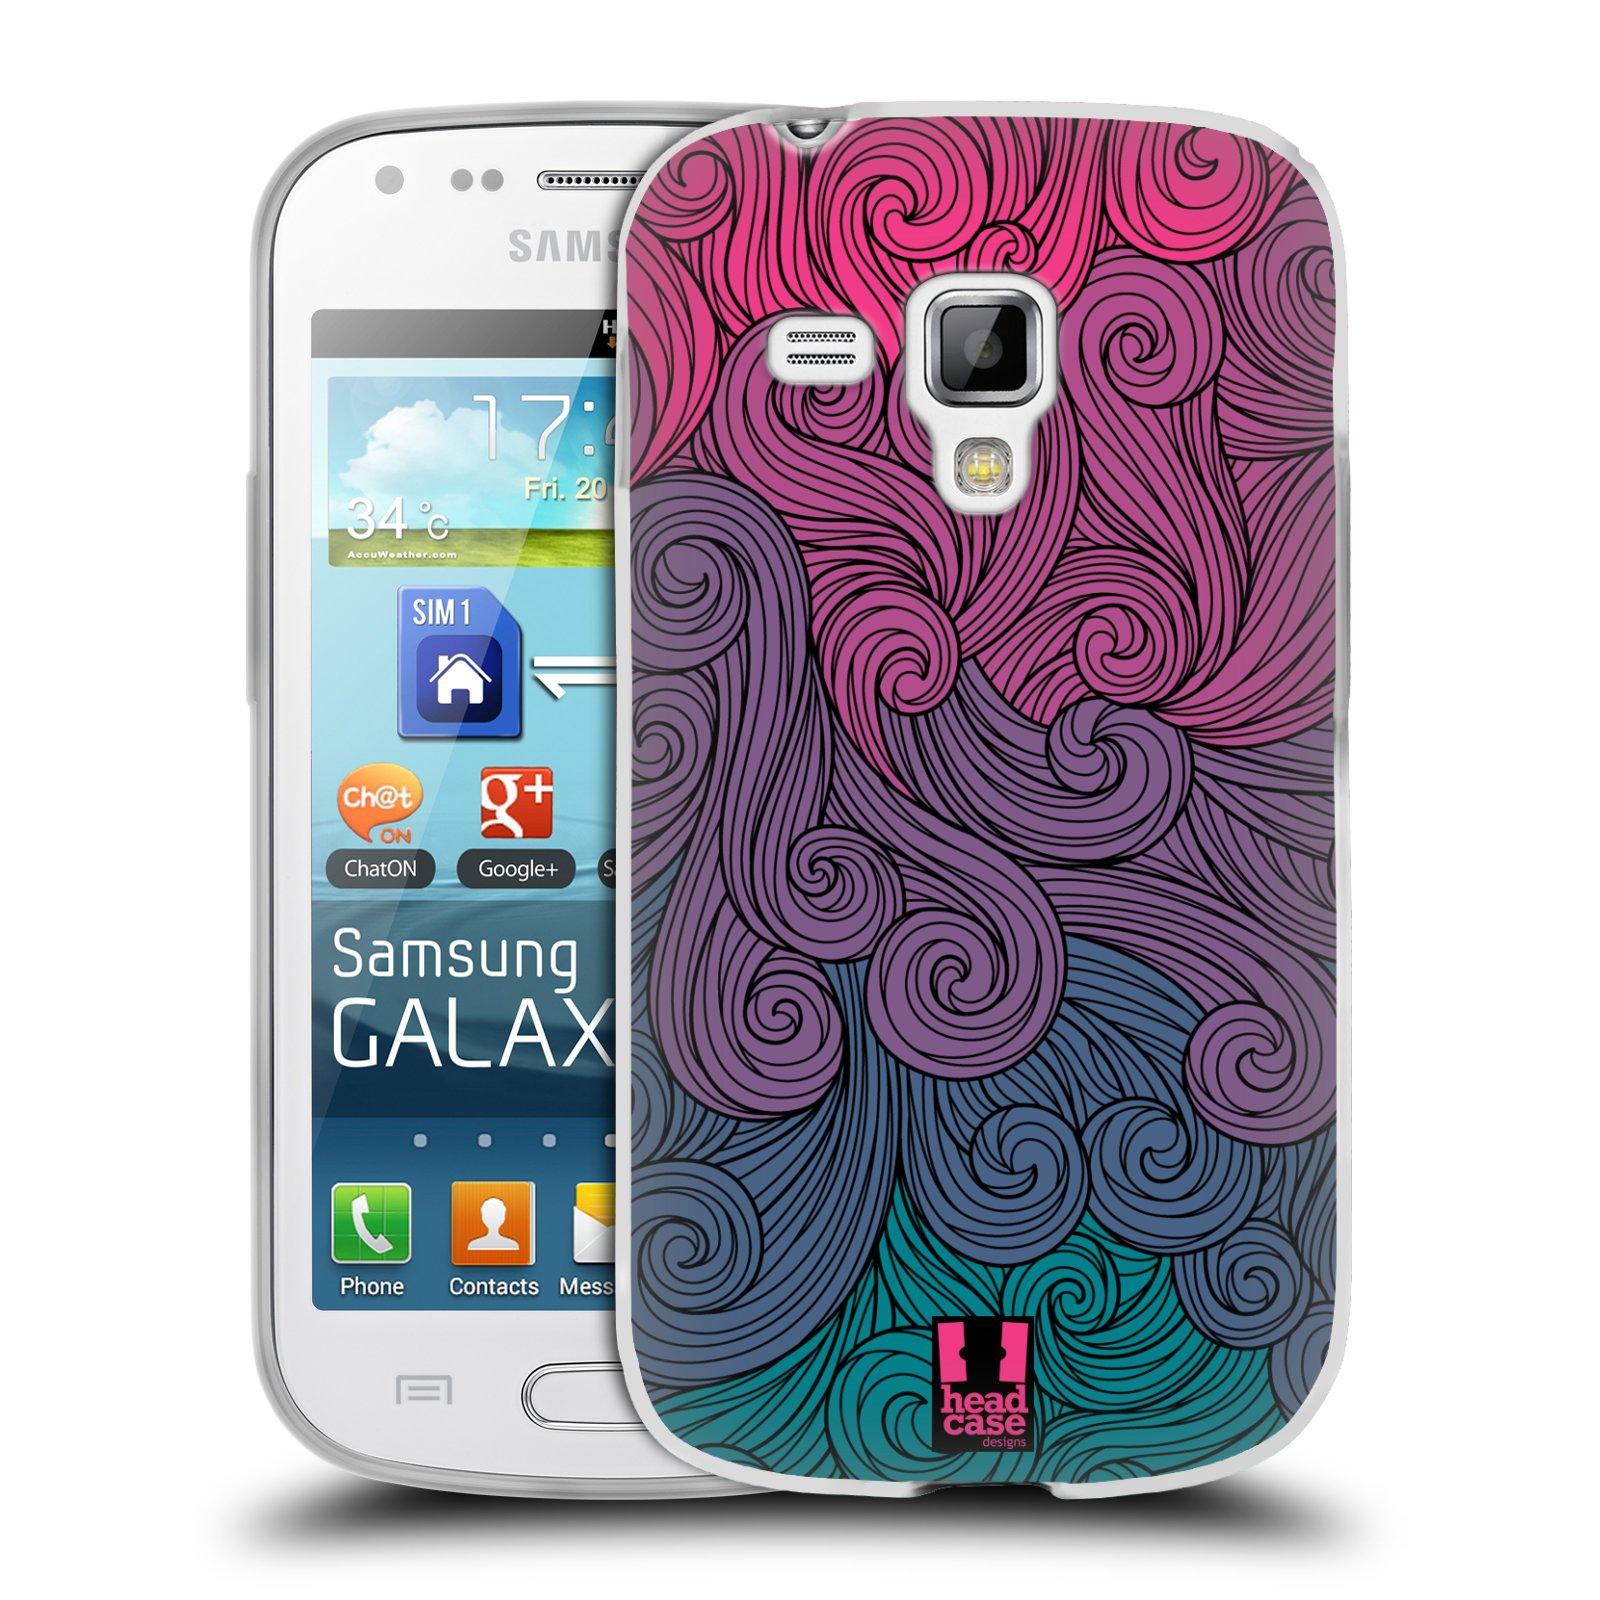 Silikonové pouzdro na mobil Samsung Galaxy Trend Plus HEAD CASE Swirls Hot Pink (Silikonový kryt či obal na mobilní telefon Samsung Galaxy Trend Plus GT-S7580)